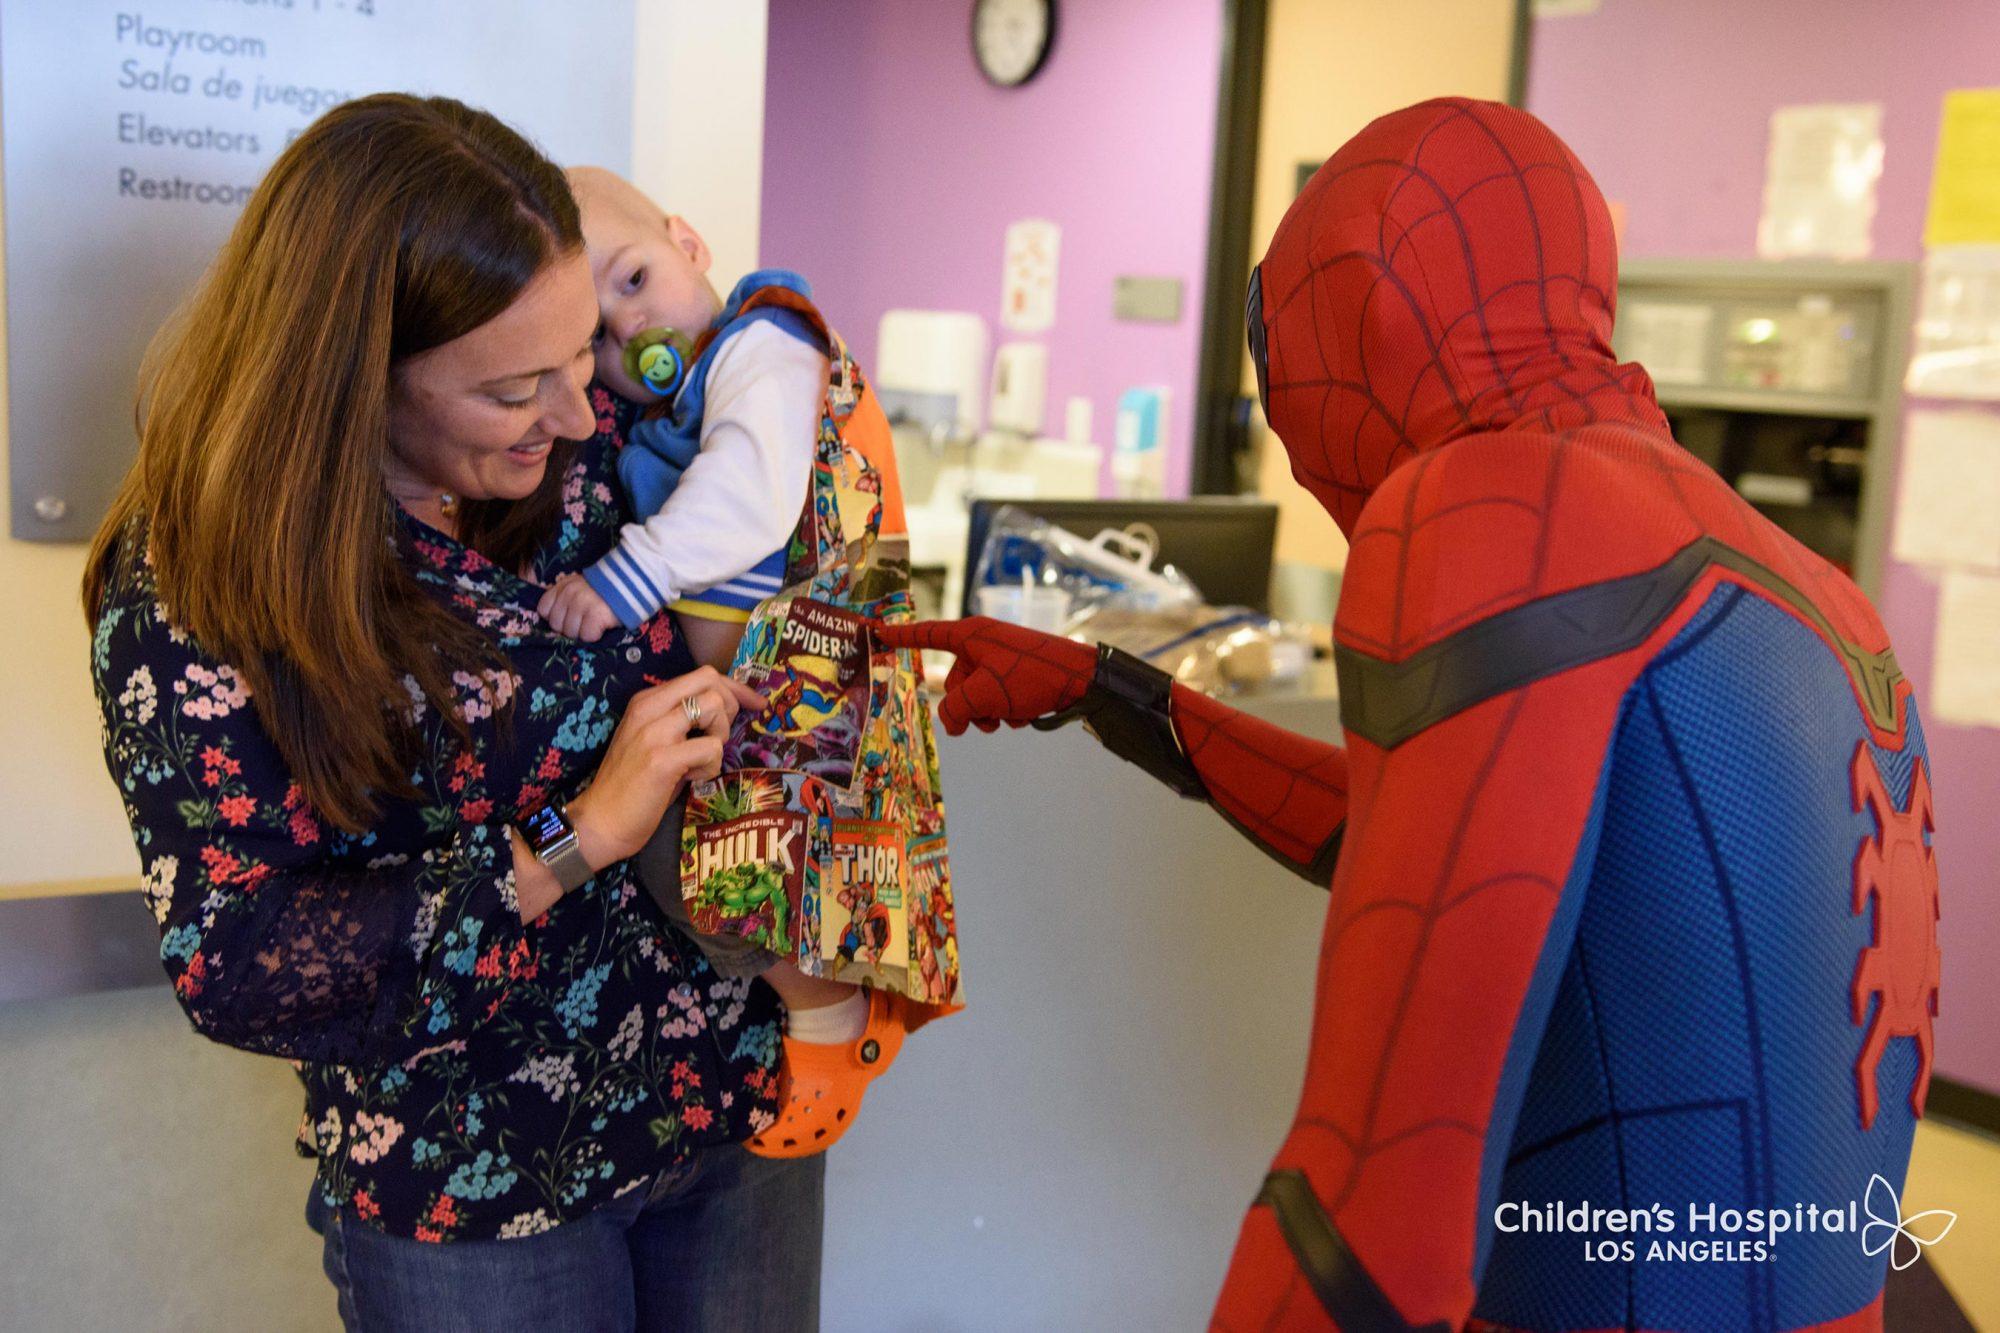 TomHolland-Spiderman-2017-5-15-wm-0187